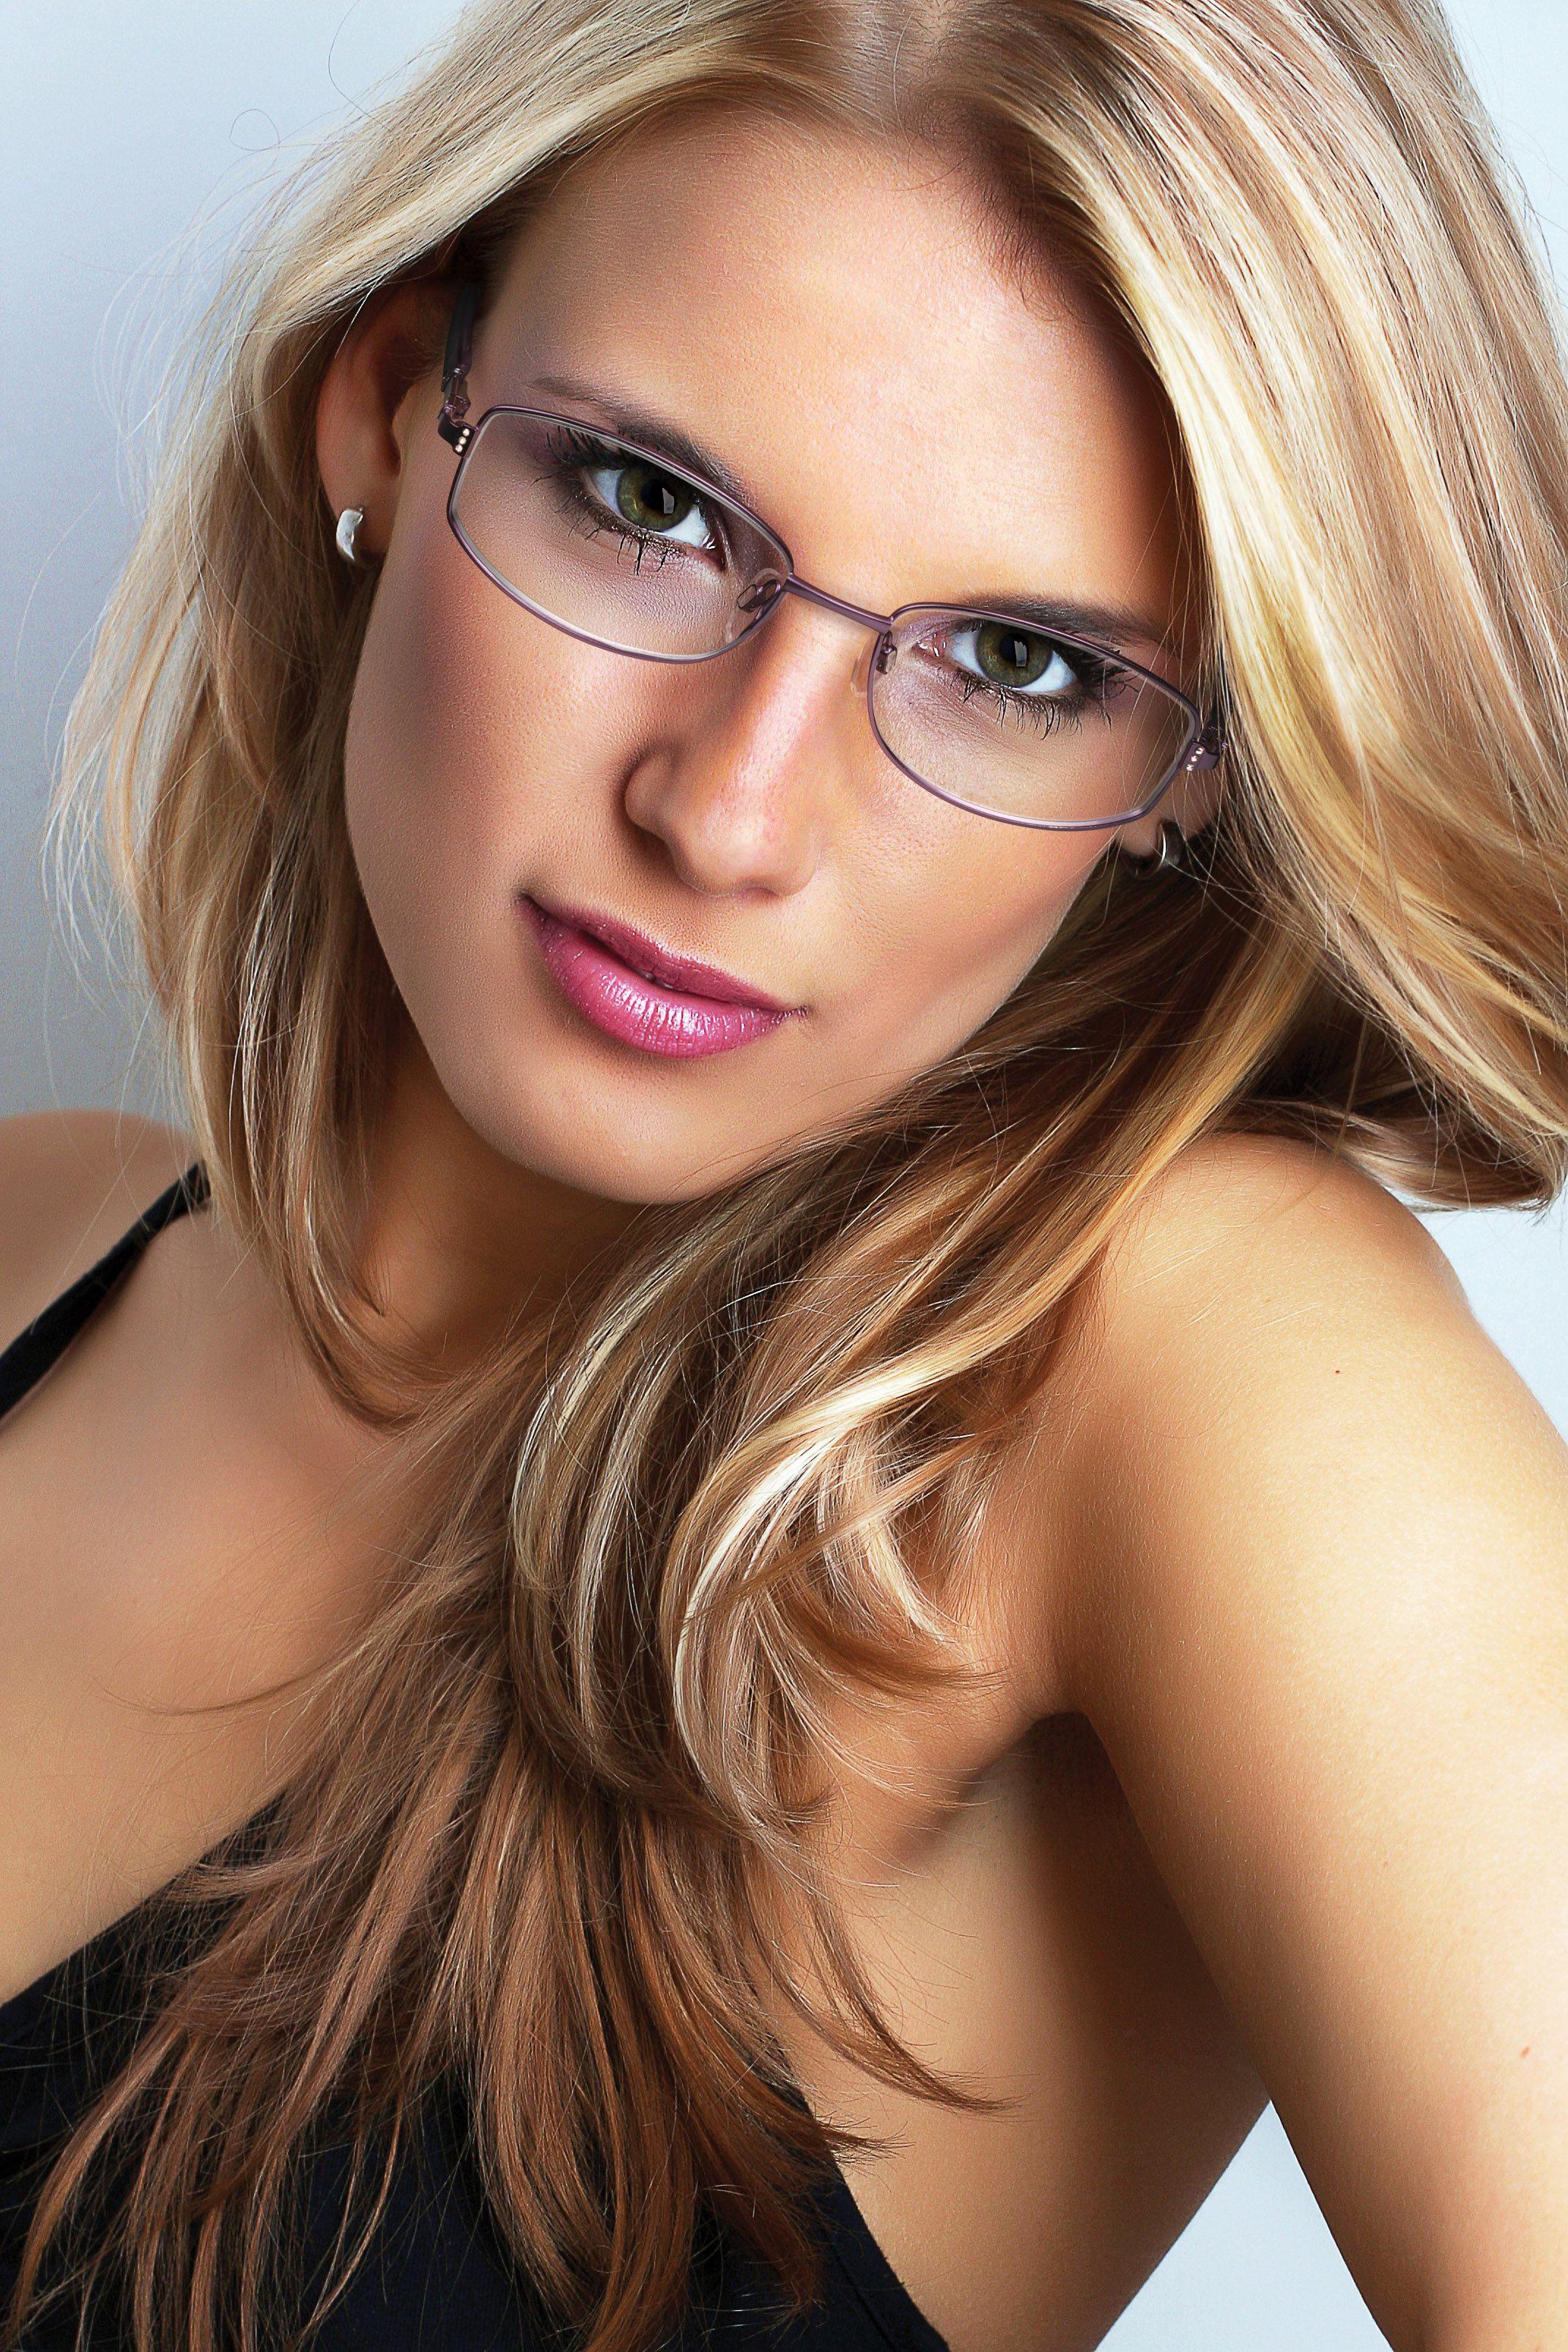 Eyeglasses frames in style - Women S Genevieve Boutique Cabaret Eye Glass Frames By Modern Optical International Like Putting On